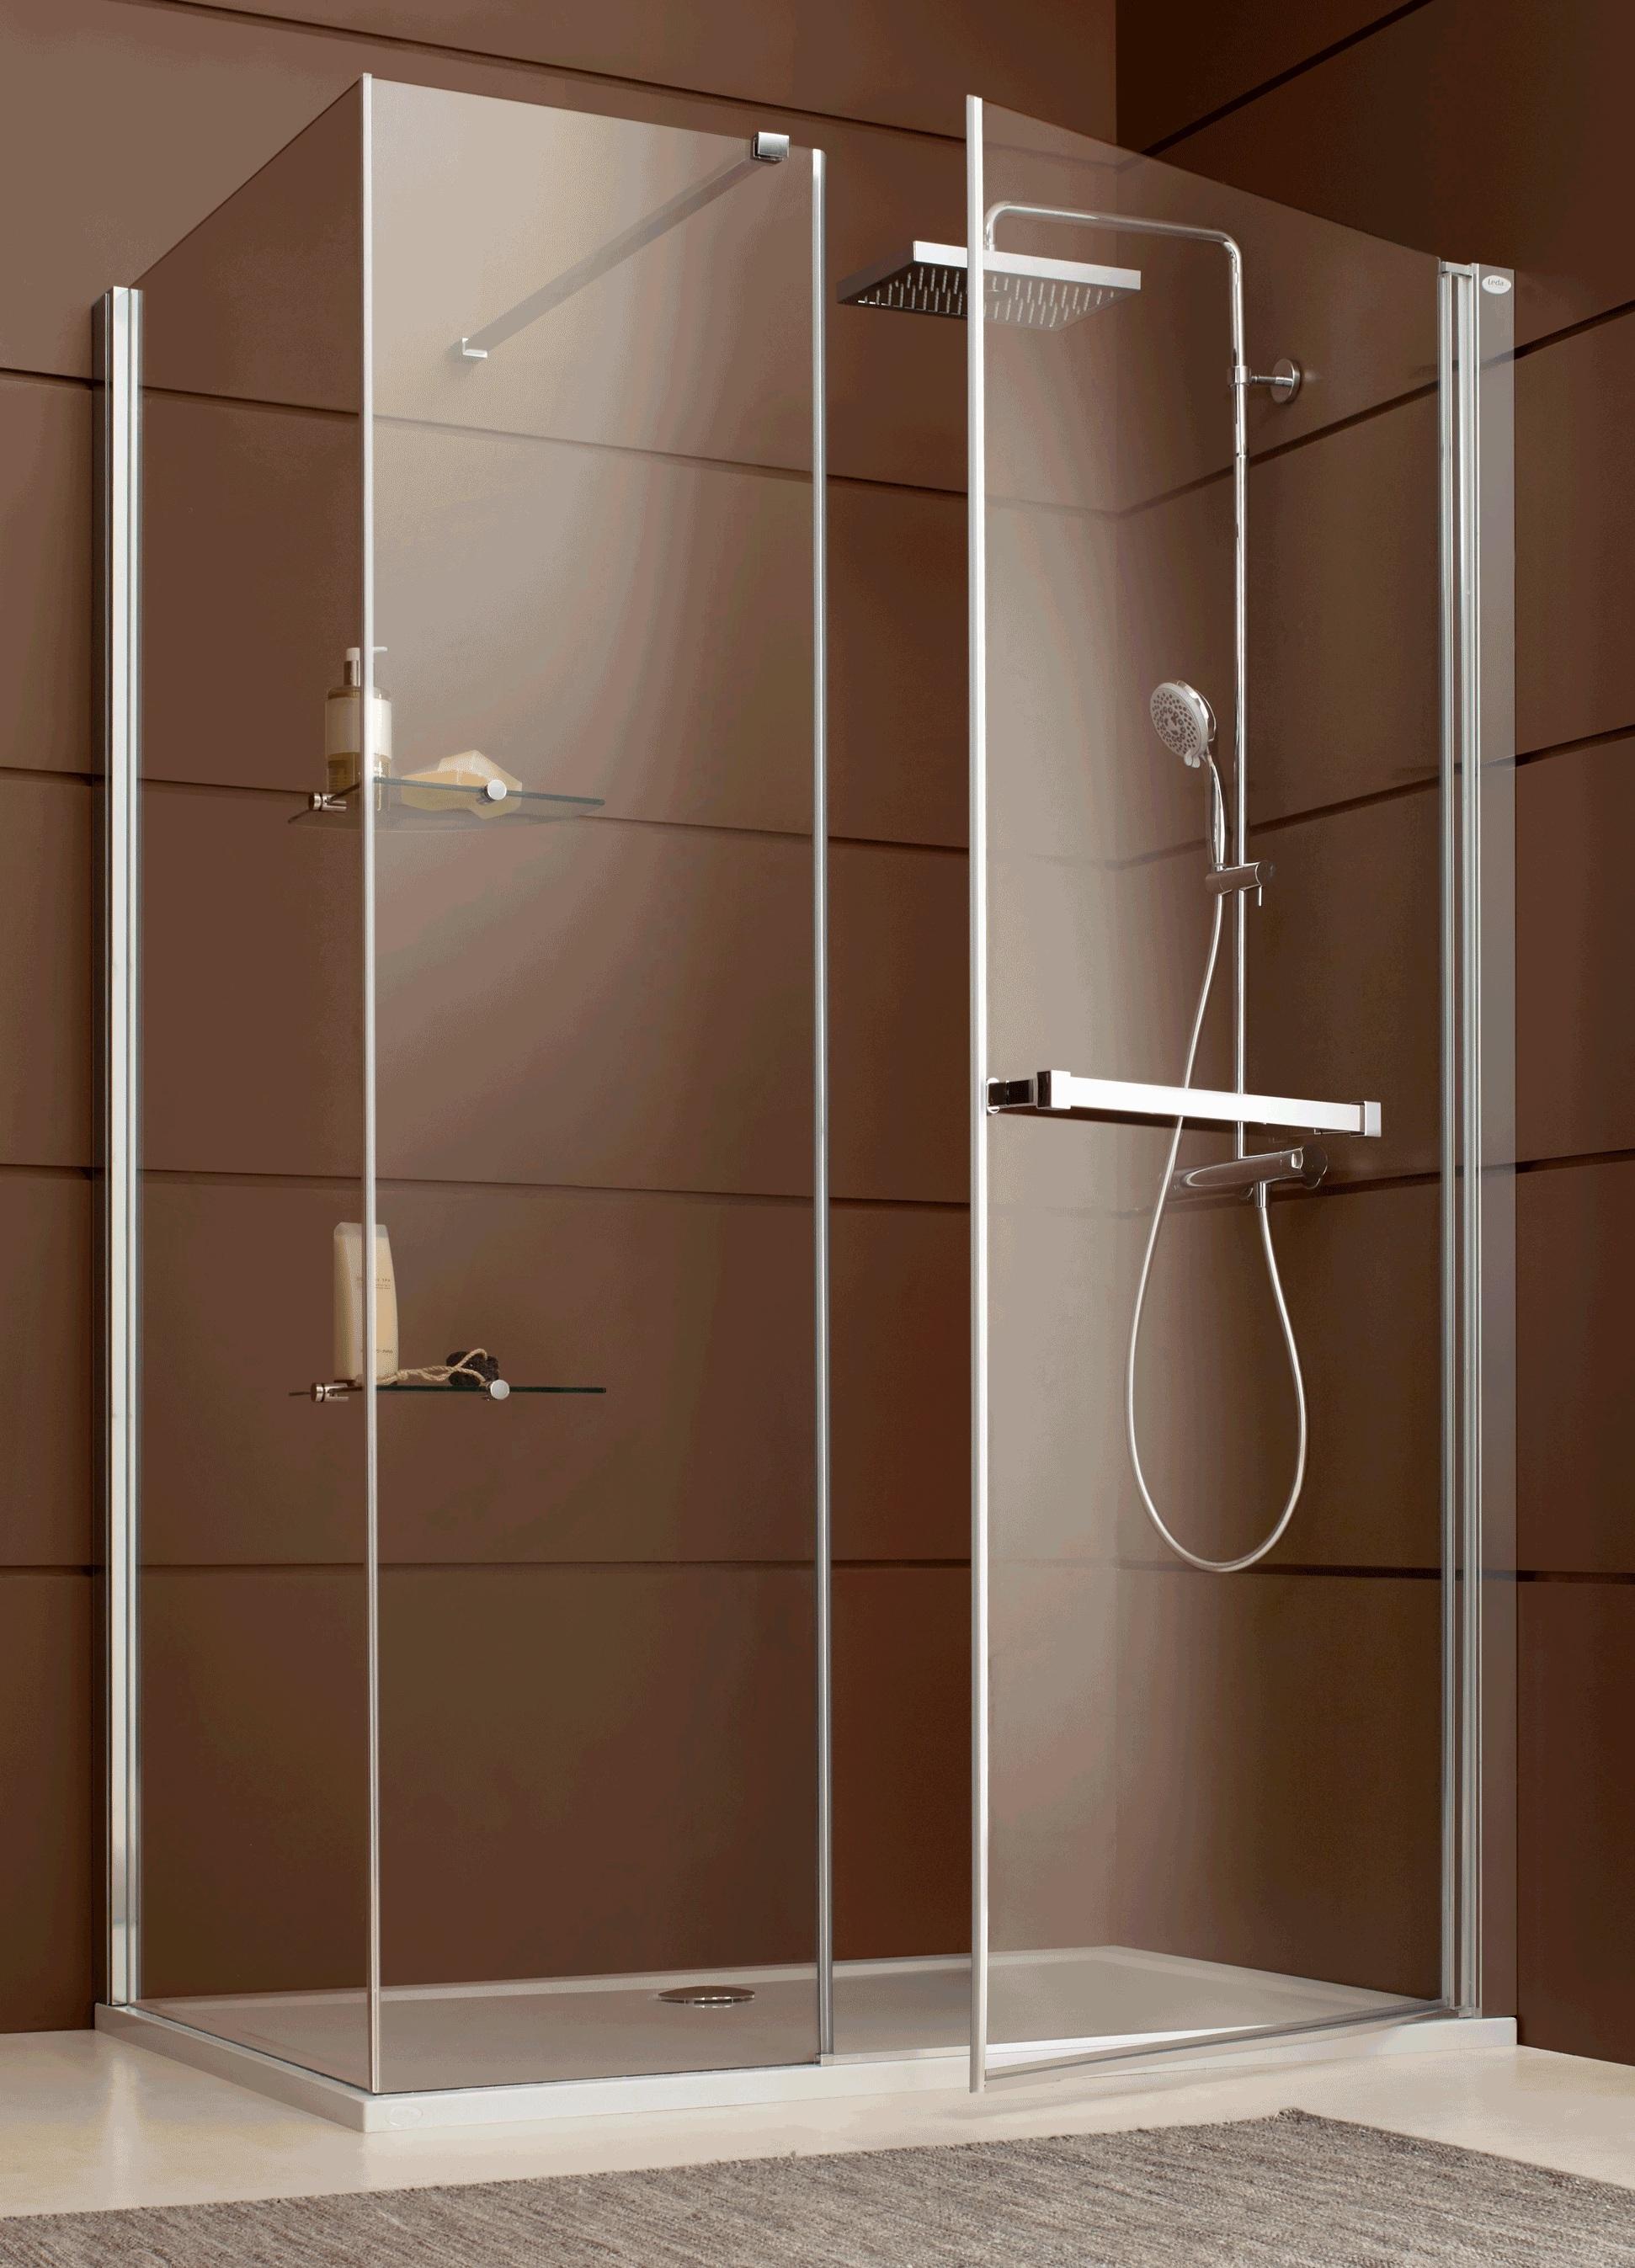 vitre opaque salle de bain vitre salle de bain opaque pour deco salle de bain fenetre opaque. Black Bedroom Furniture Sets. Home Design Ideas